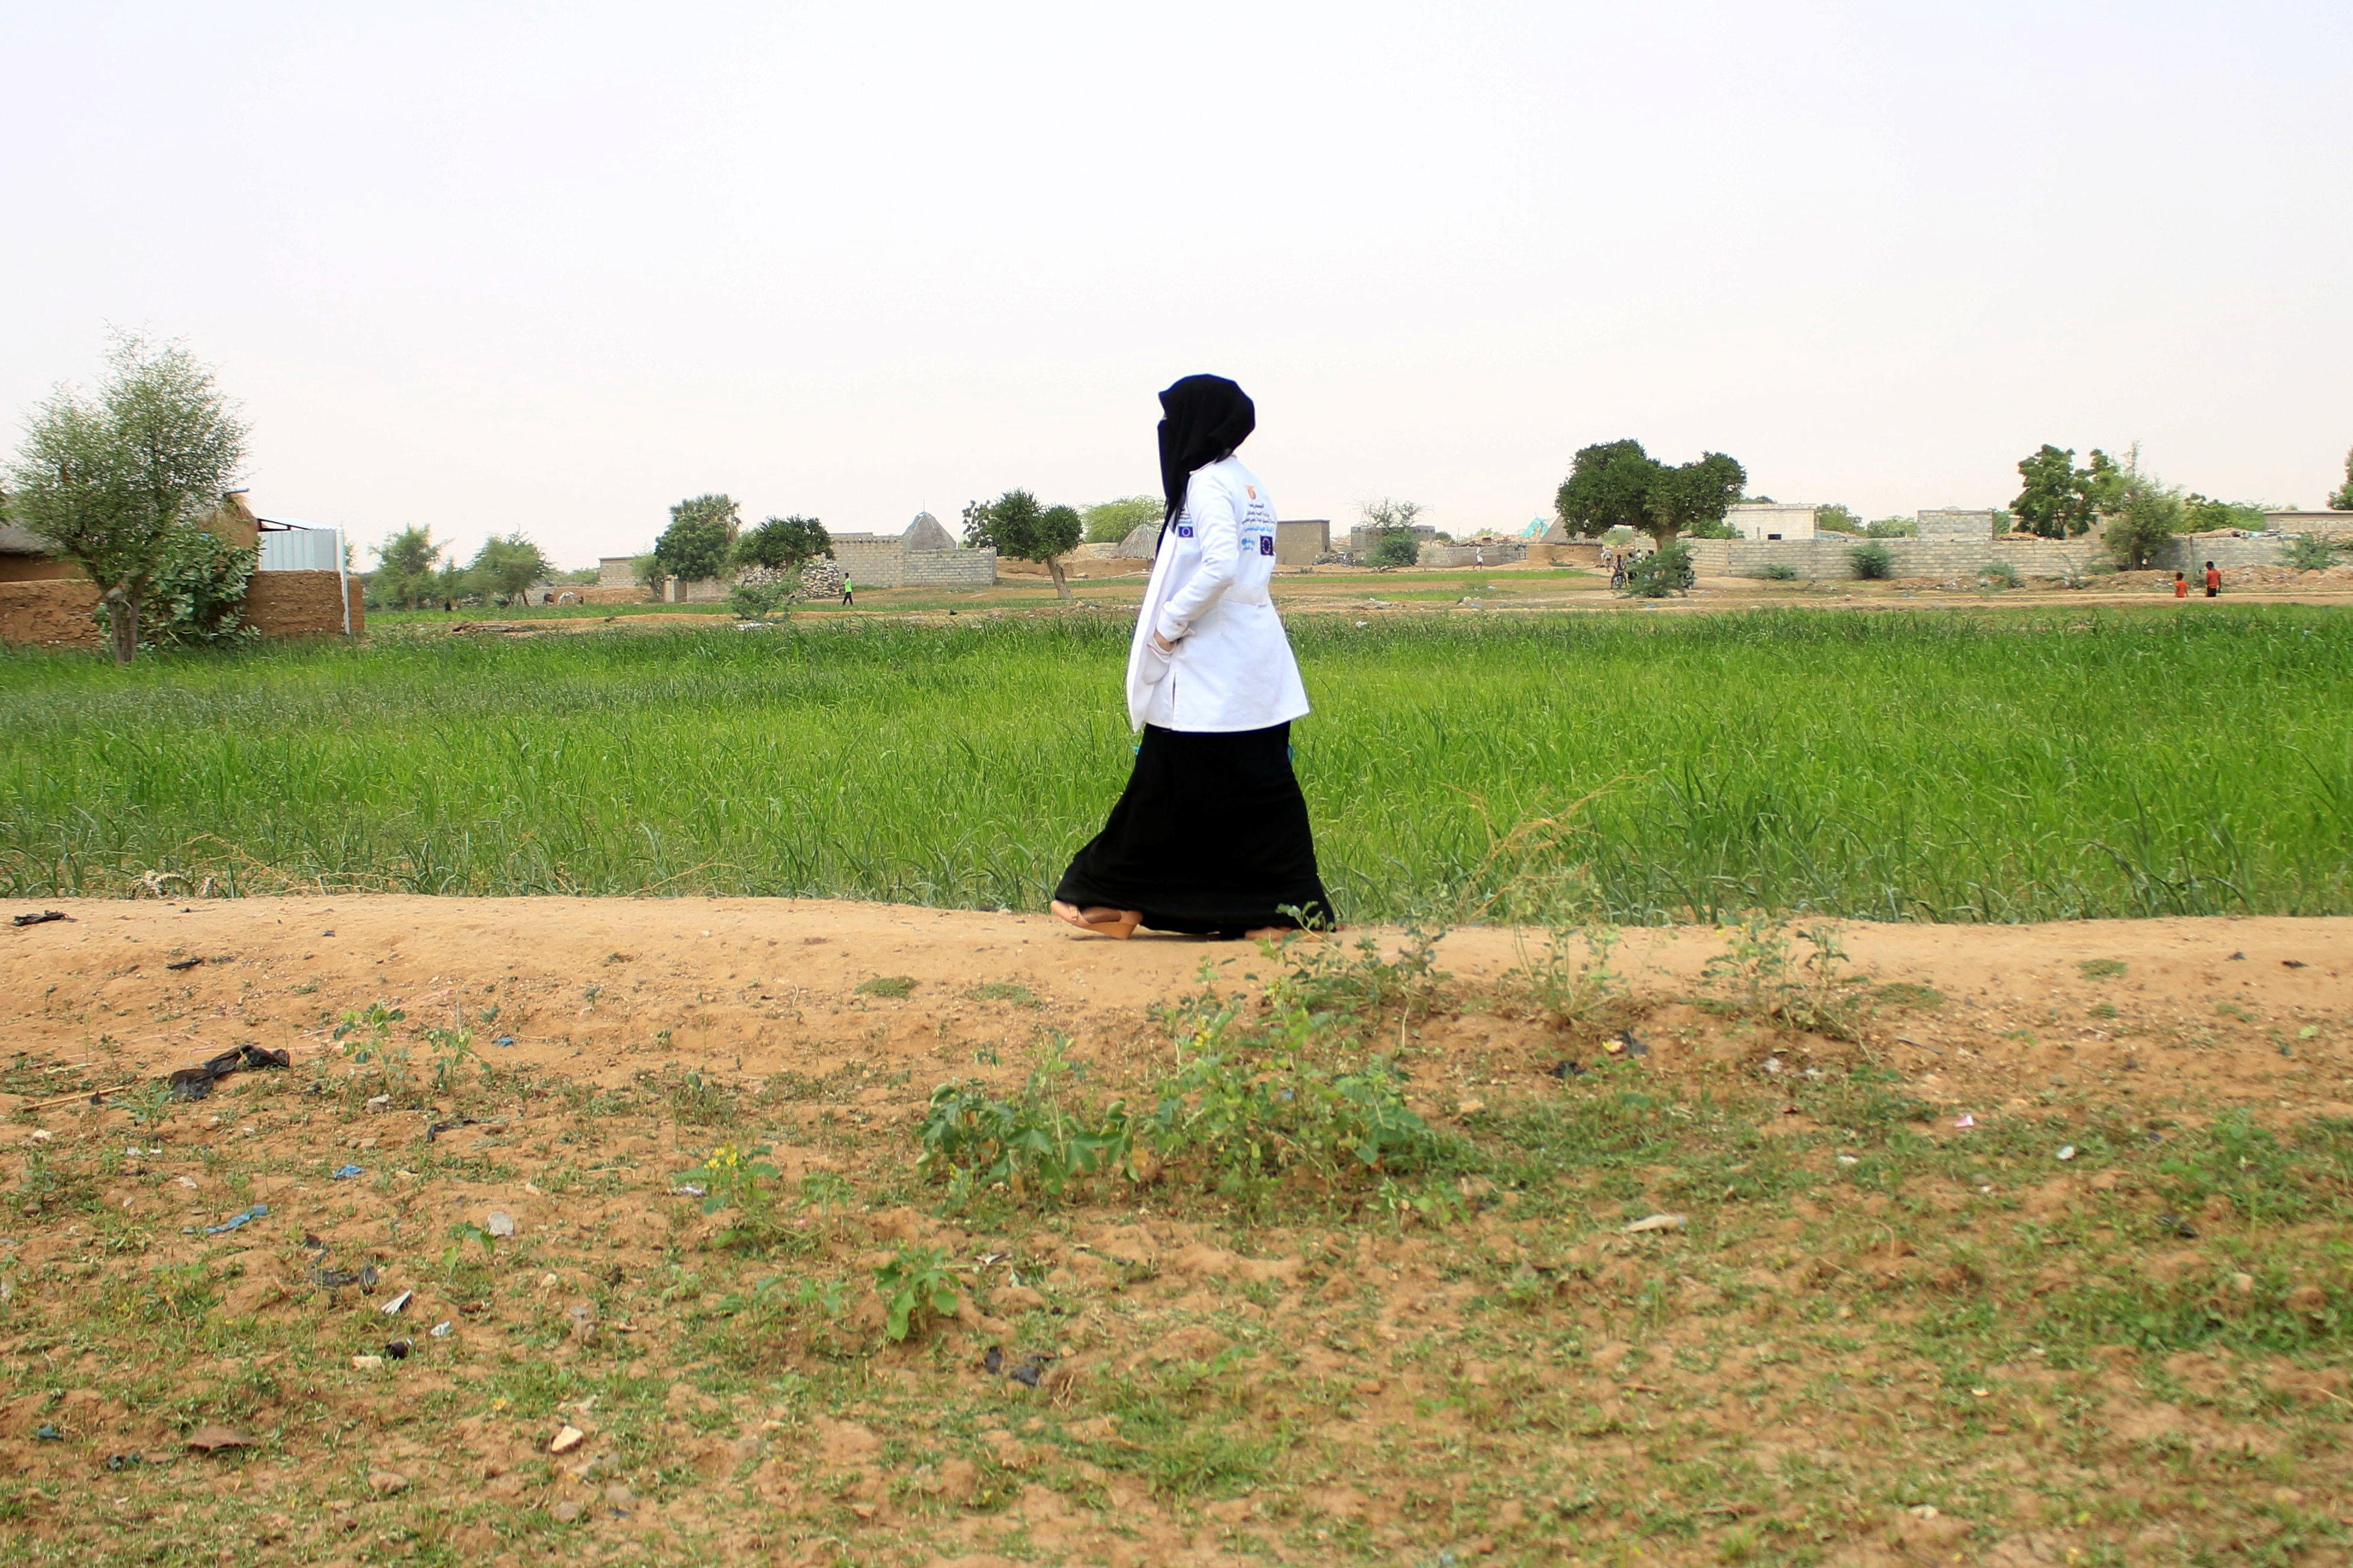 Volunteer health worker Ashwaq Muharram walks in Abs, Yemen August 31, 2021. Picture taken August 31, 2021. REUTERS/Eissa Alragehi